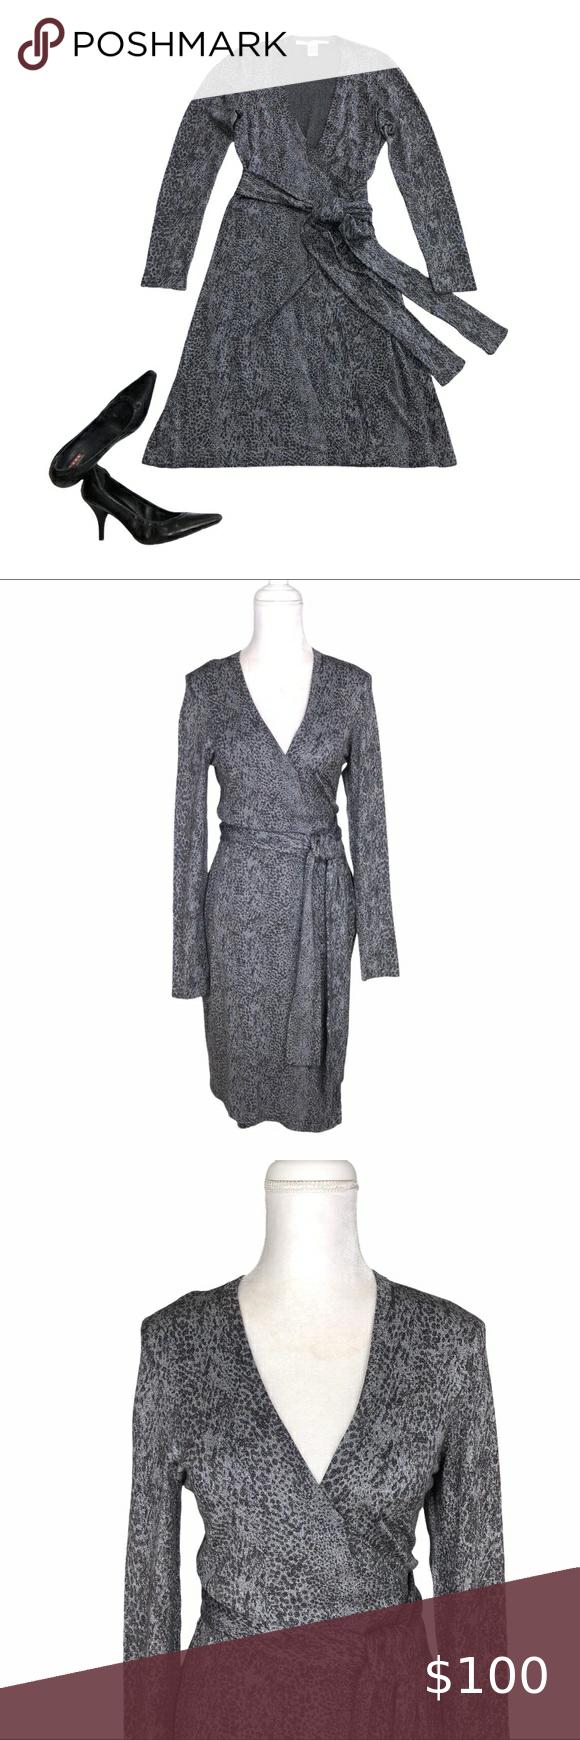 Diane Von Furstenberg Wrap Dress Silver Black Gray Diane Von Furstenberg Wrap Dress Dvf Wrap Dress Silver Dress [ 1740 x 580 Pixel ]